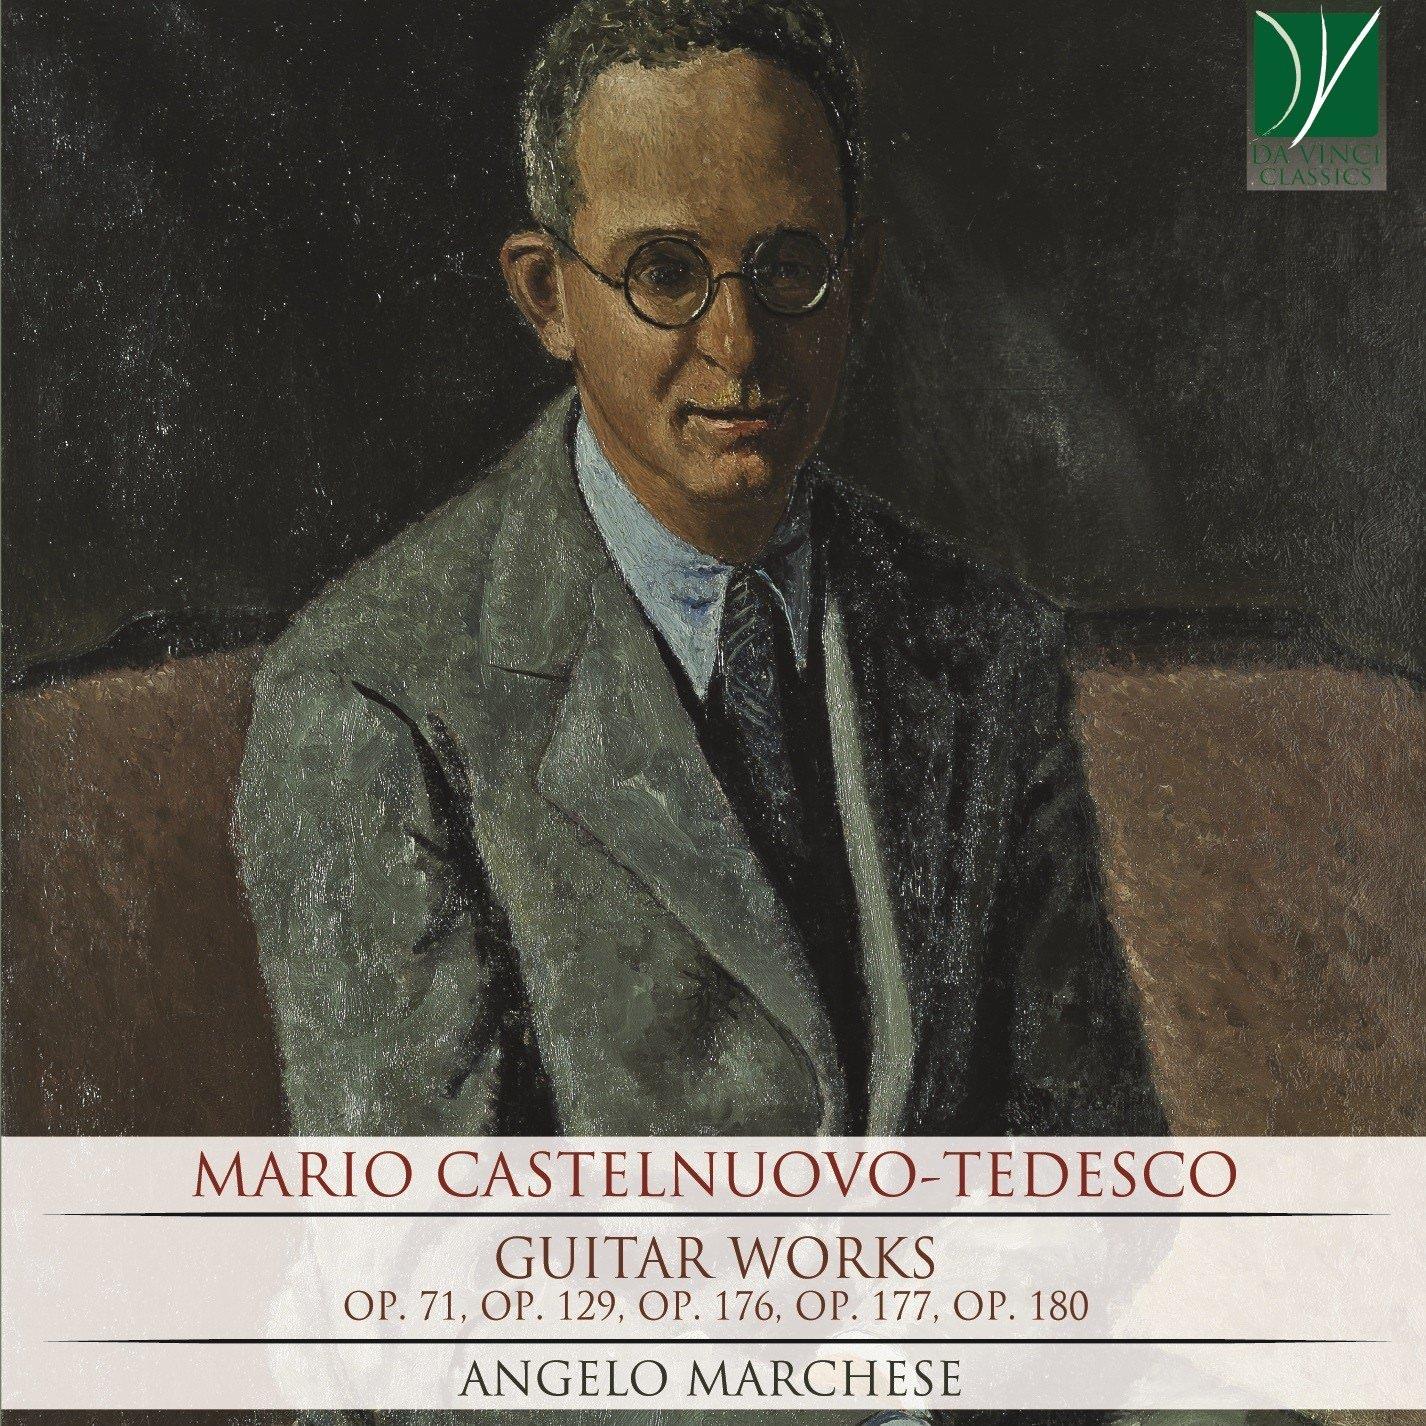 Mario Castelnuovo-Tedesco, Angelo Marchese